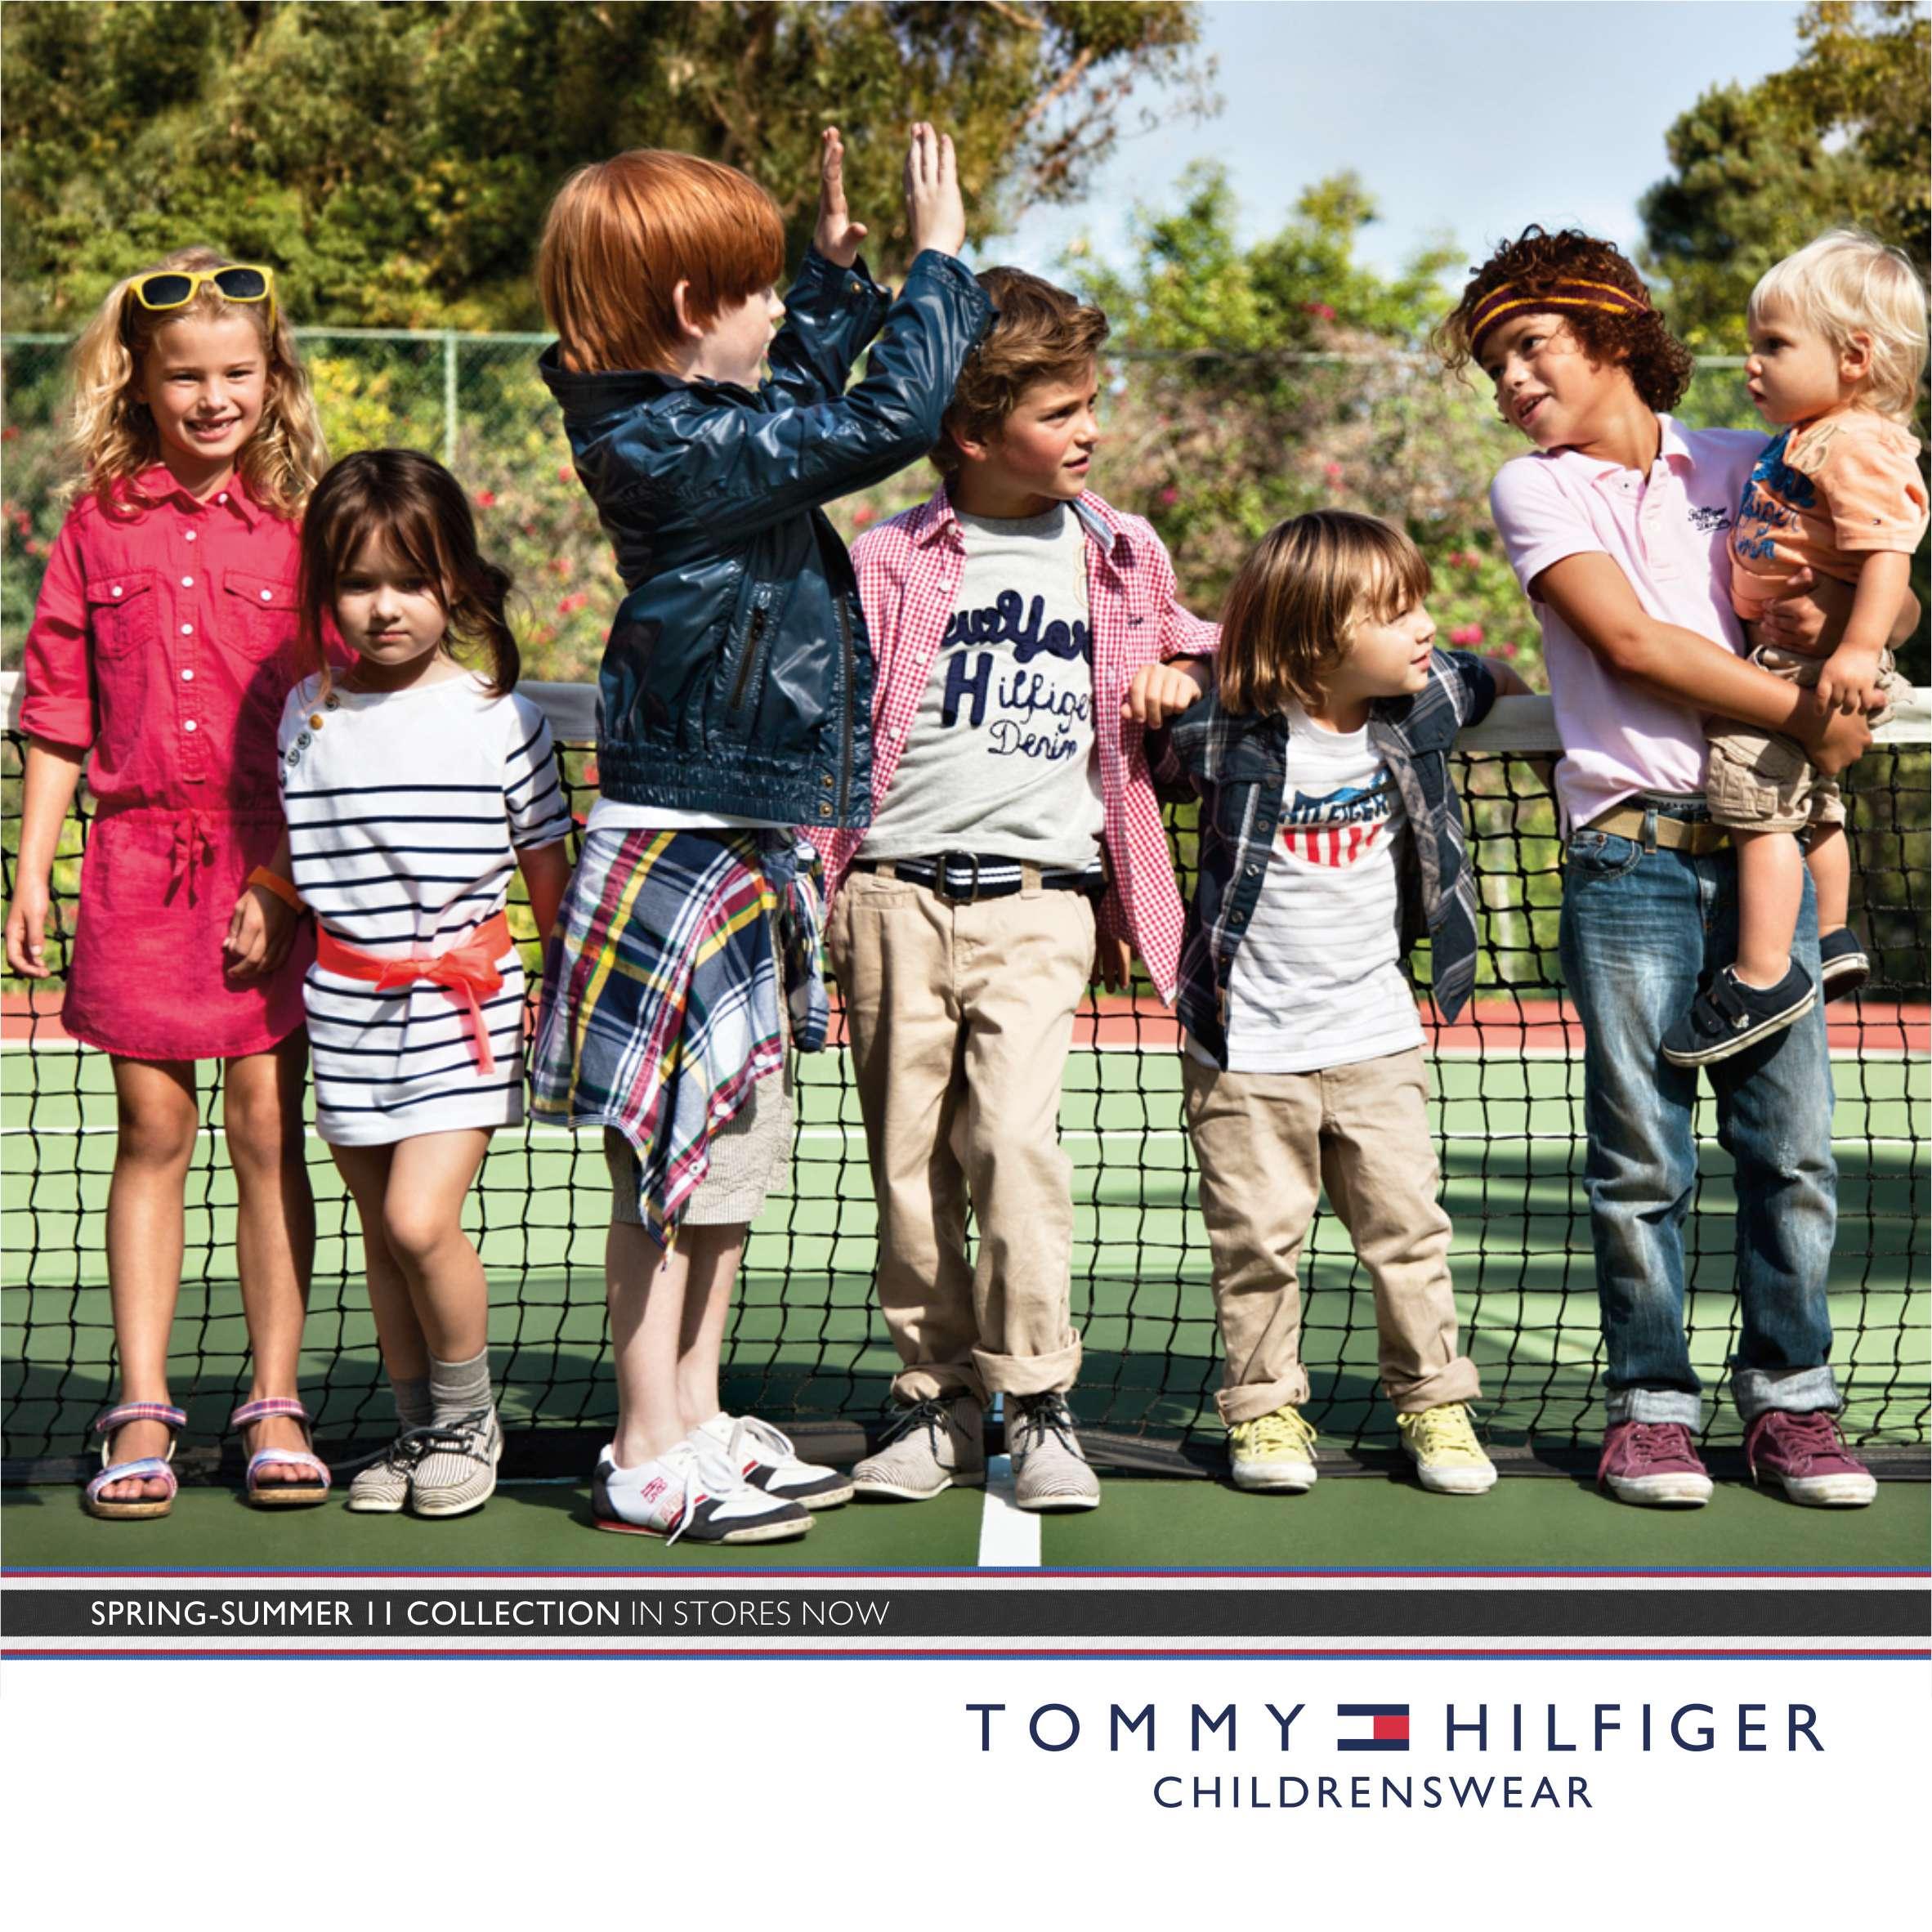 Tommy Hilfiger BB衫 低至半價+可直送香港/澳門